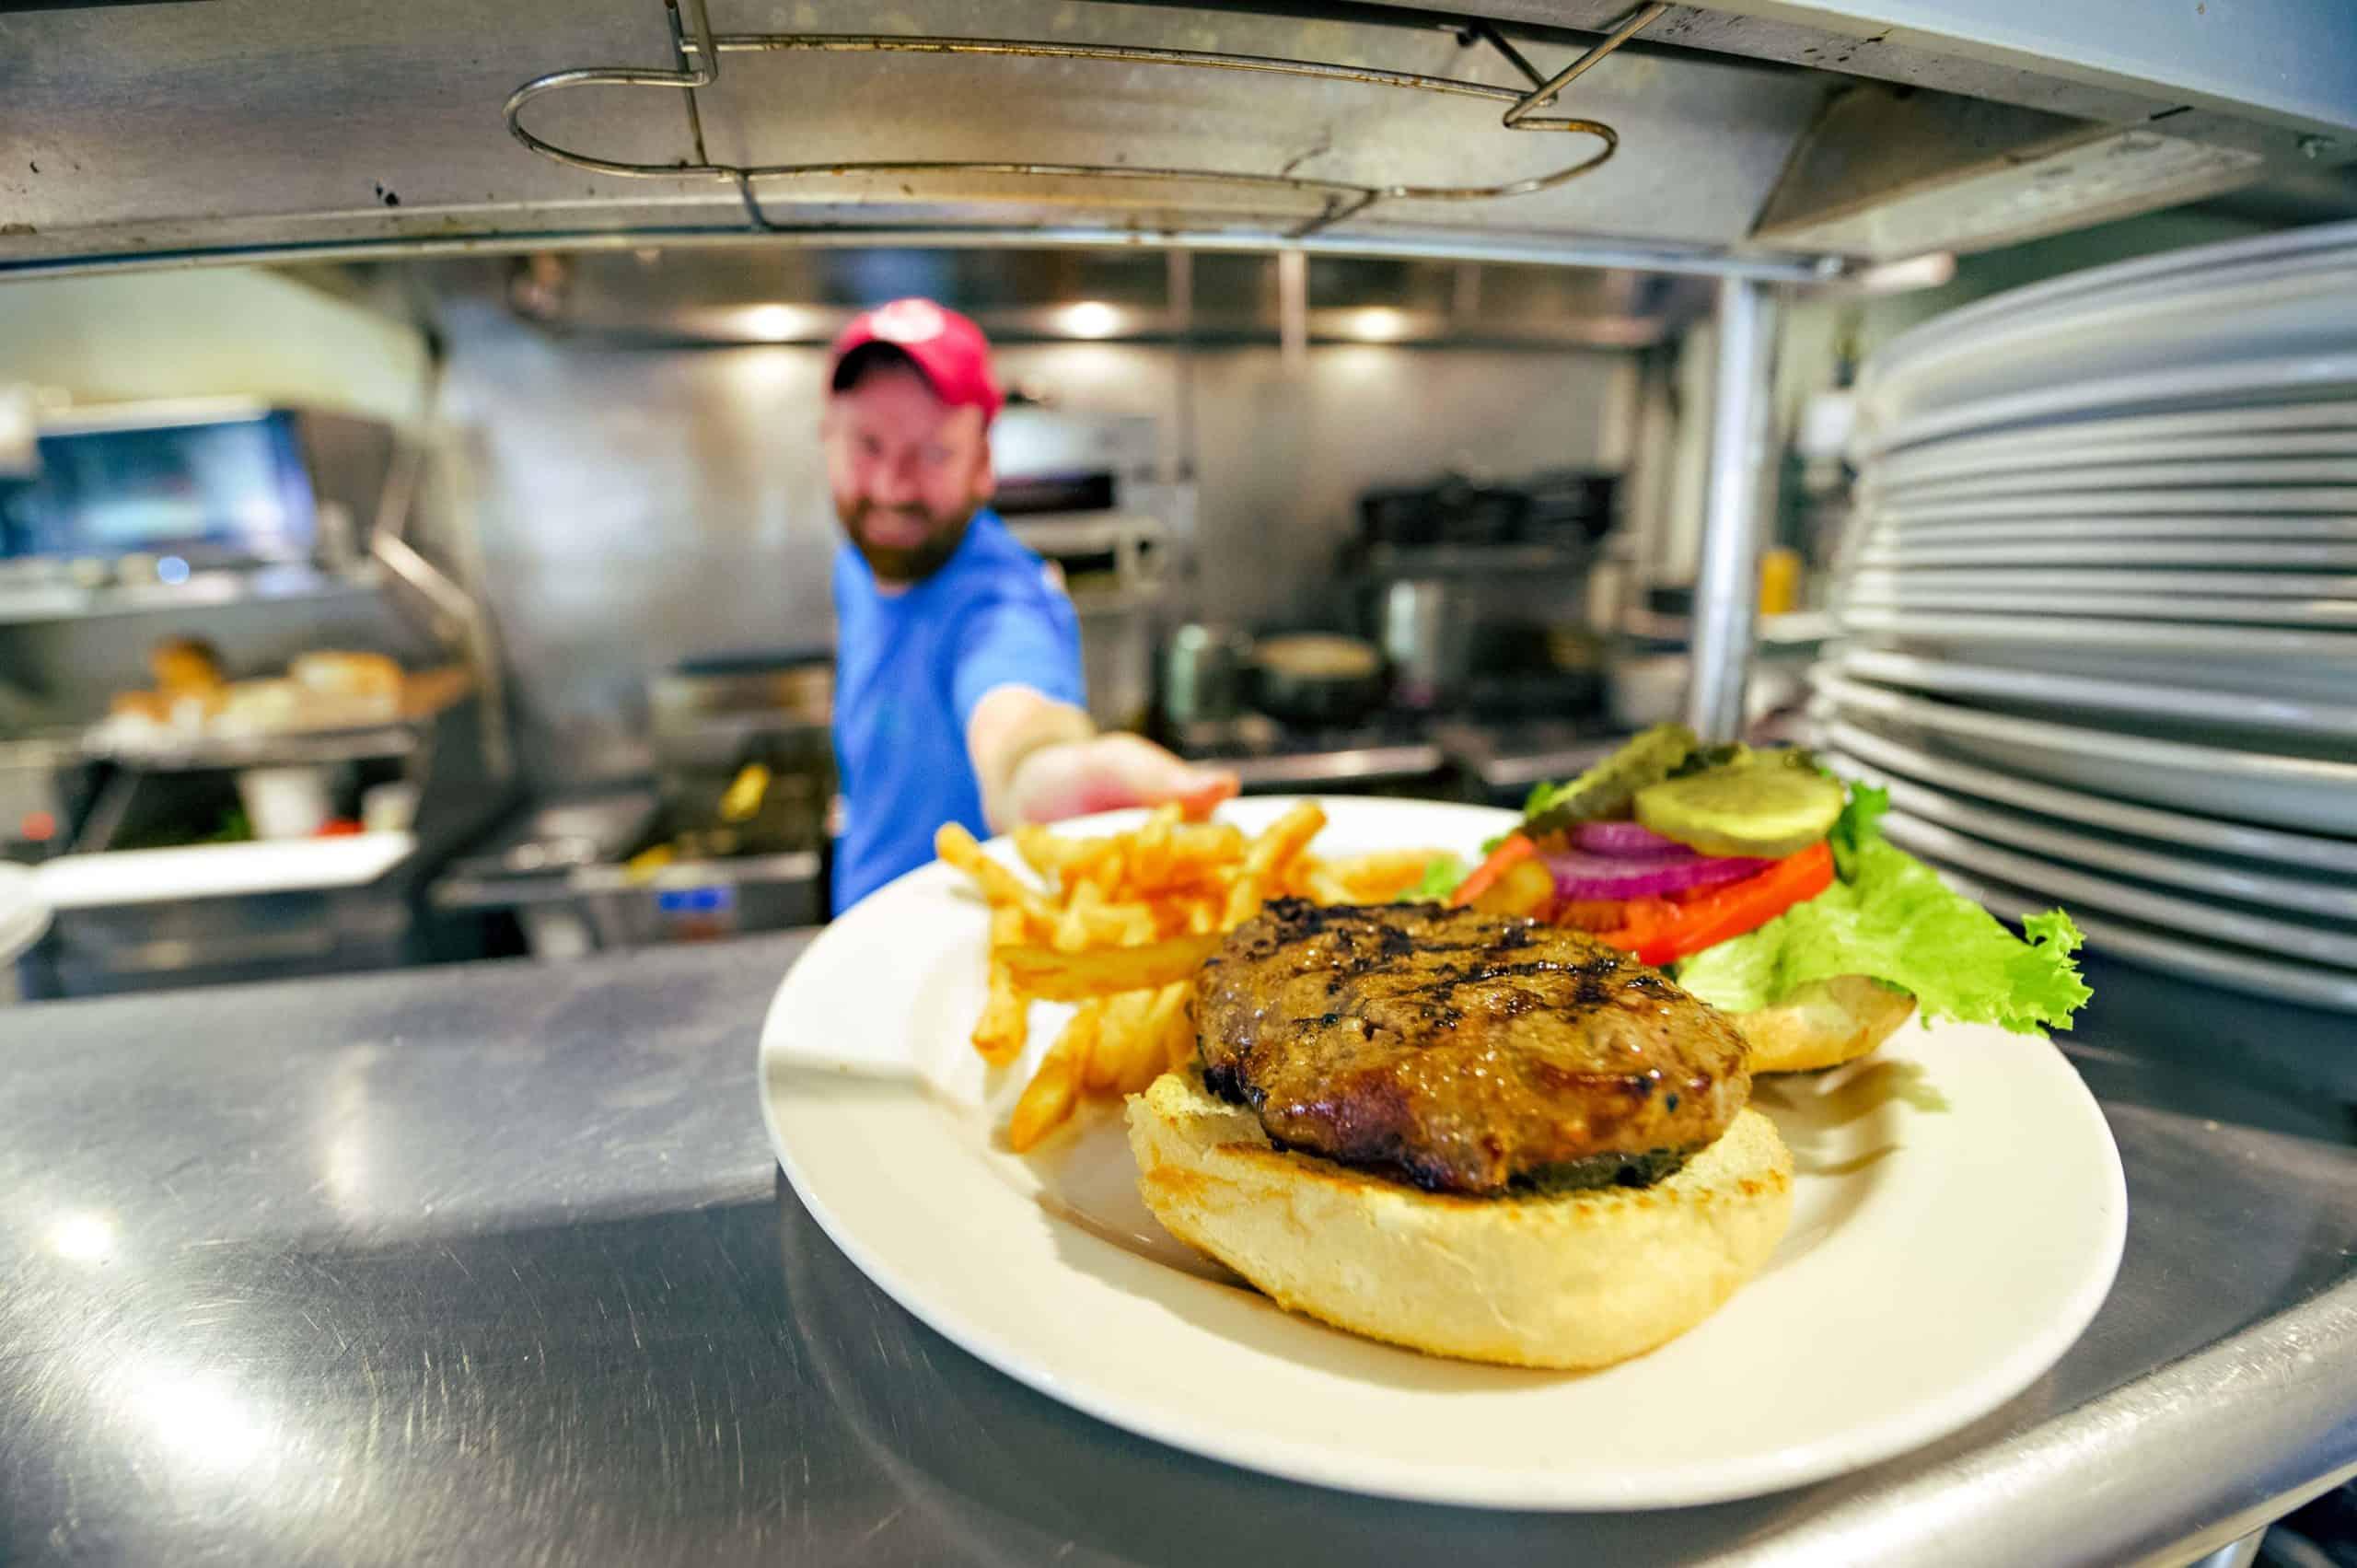 Man serves a burger from the kitchen of Café Alfresco